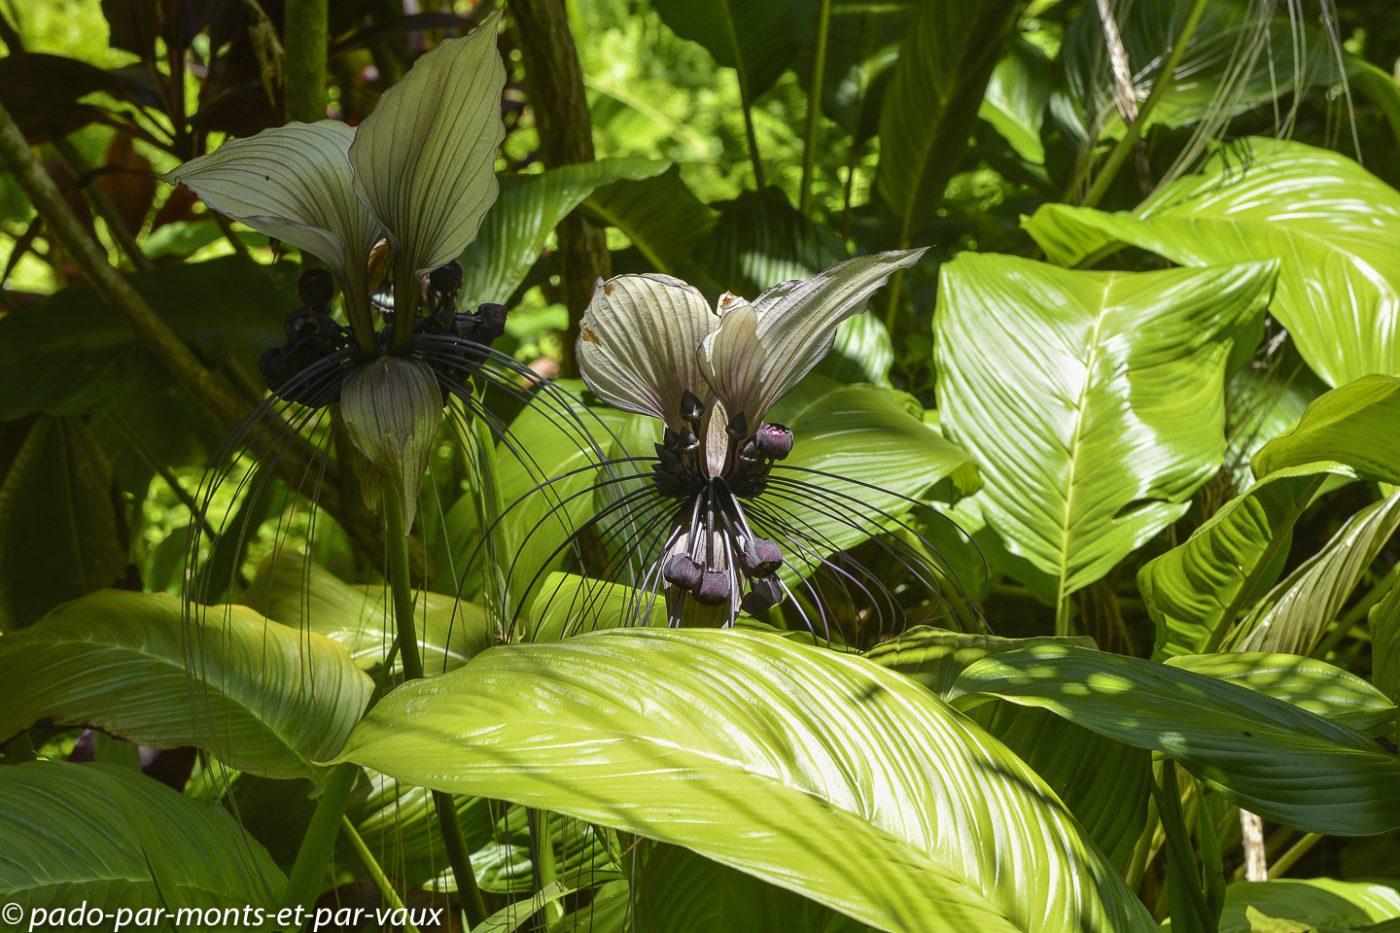 Hawaii tropical botanical garden  -  Plante chauve-souris